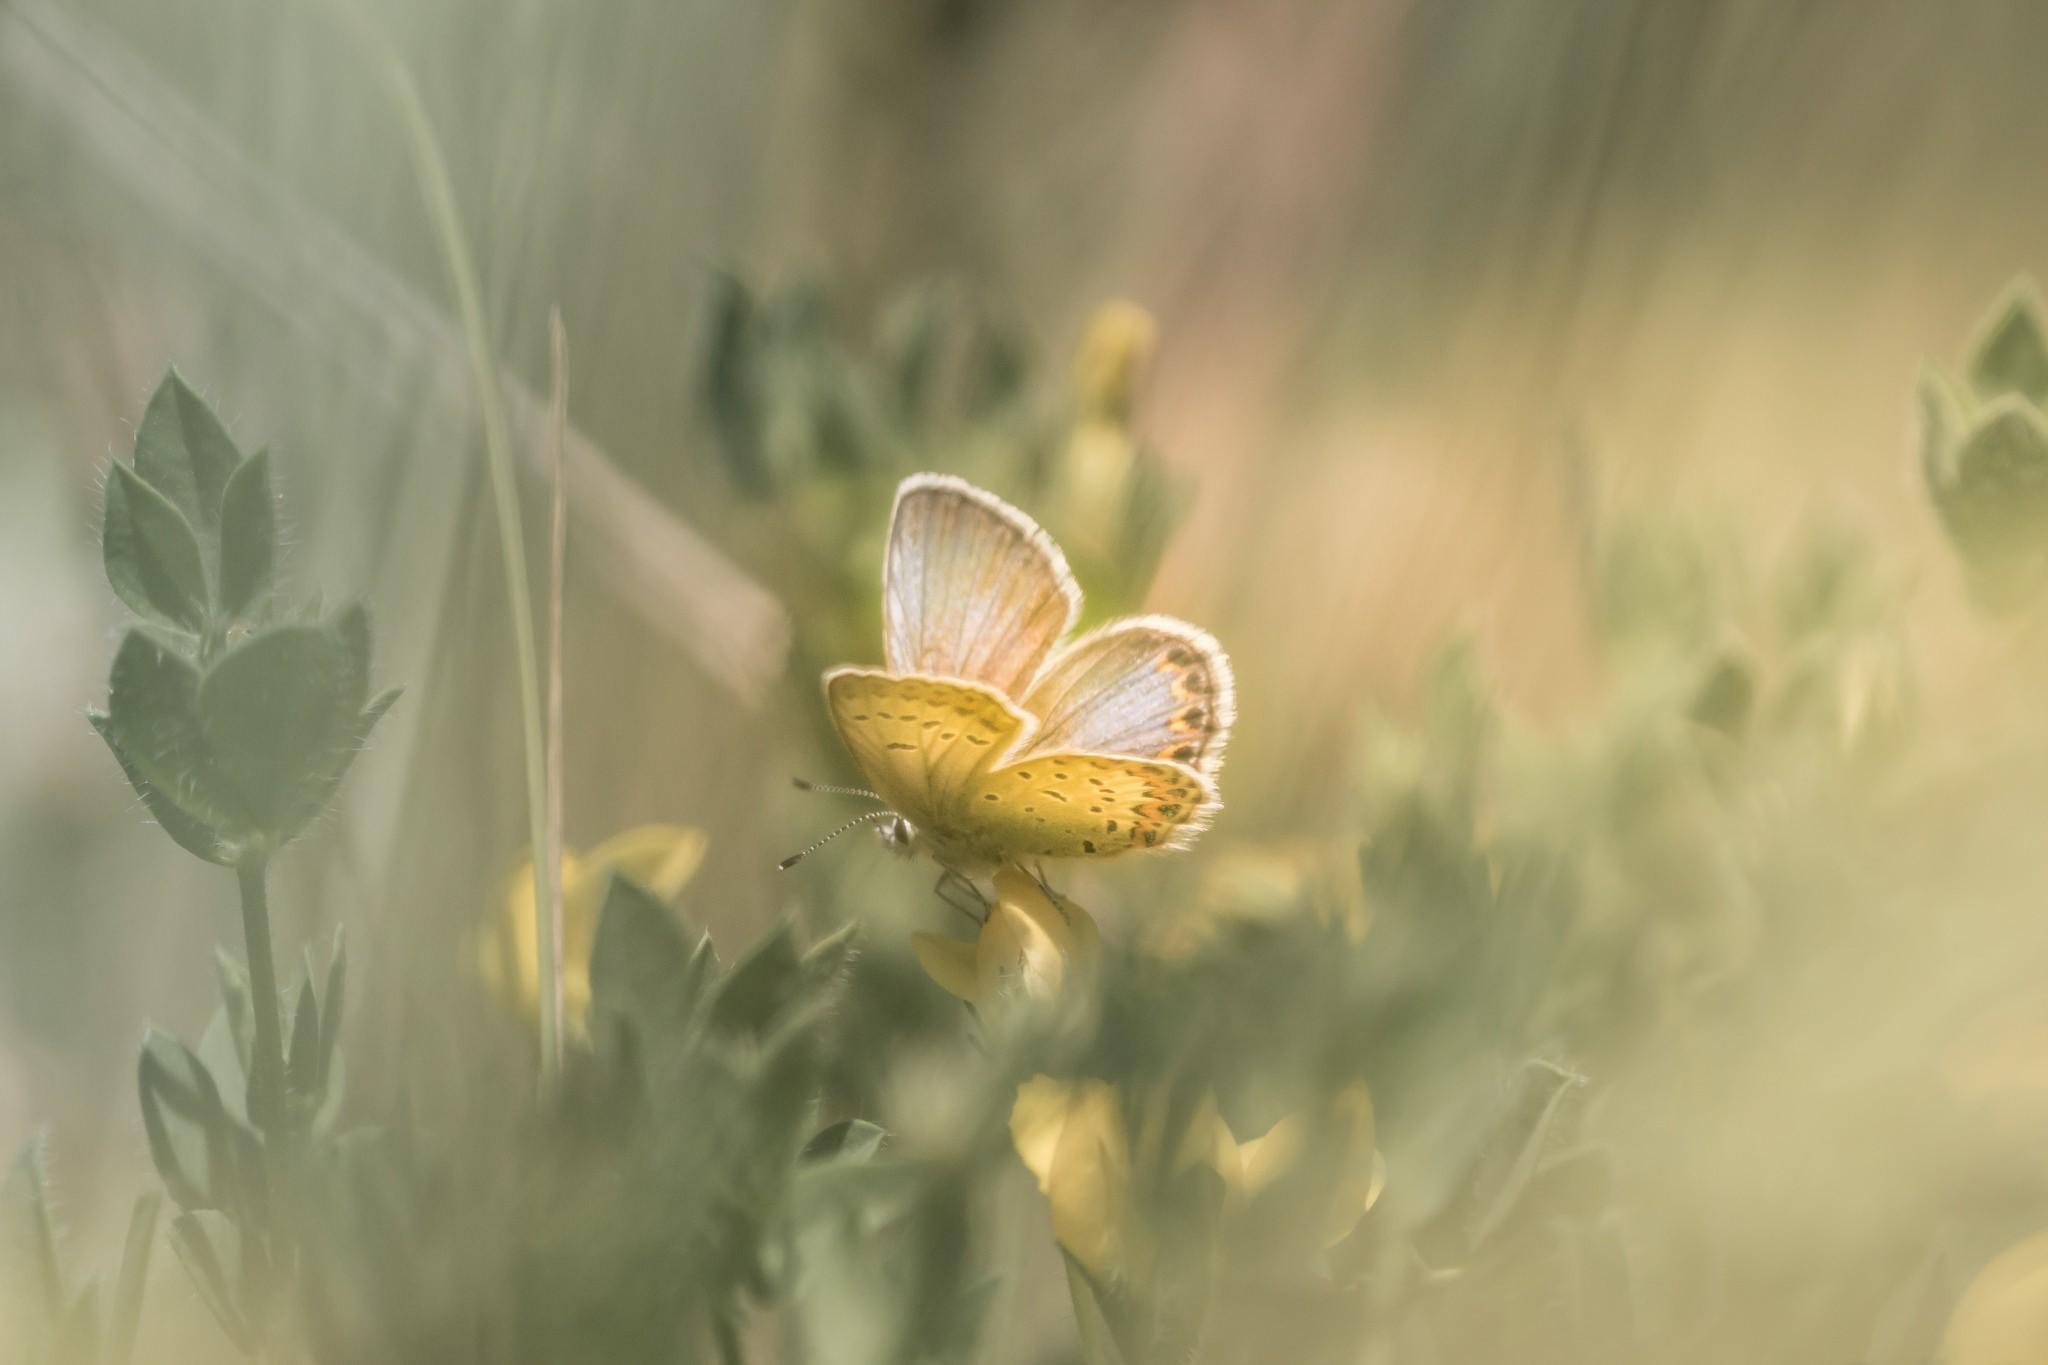 Wallpaper Sunlight Leaves Nature Plants Butterfly Green